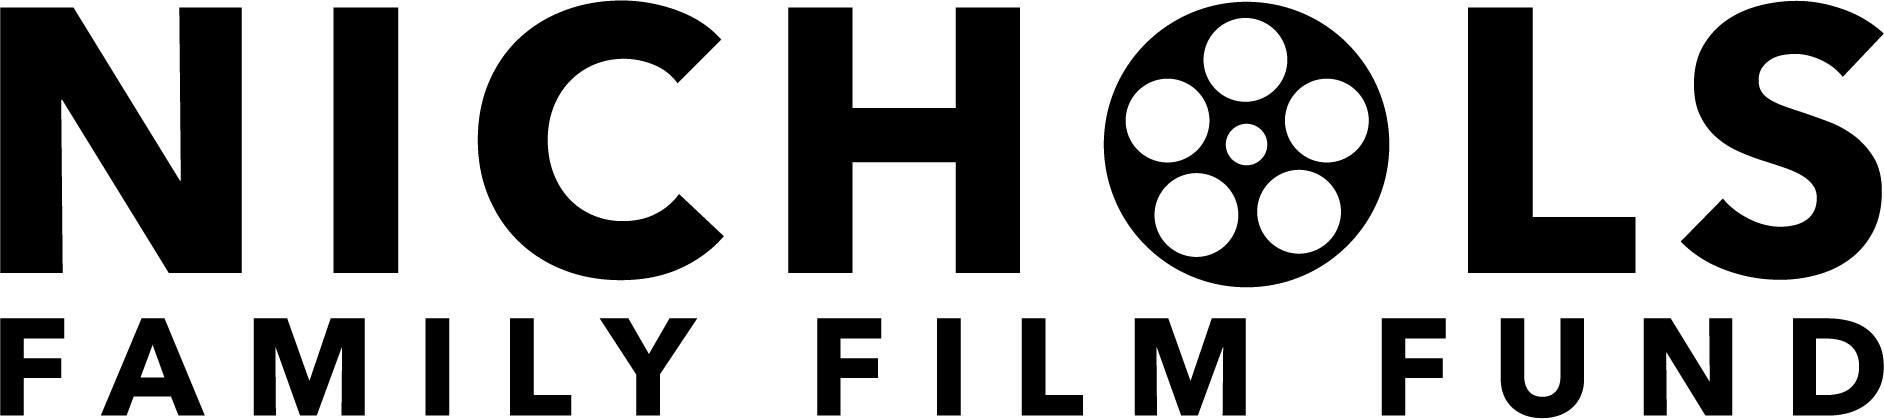 nichols logo black.png